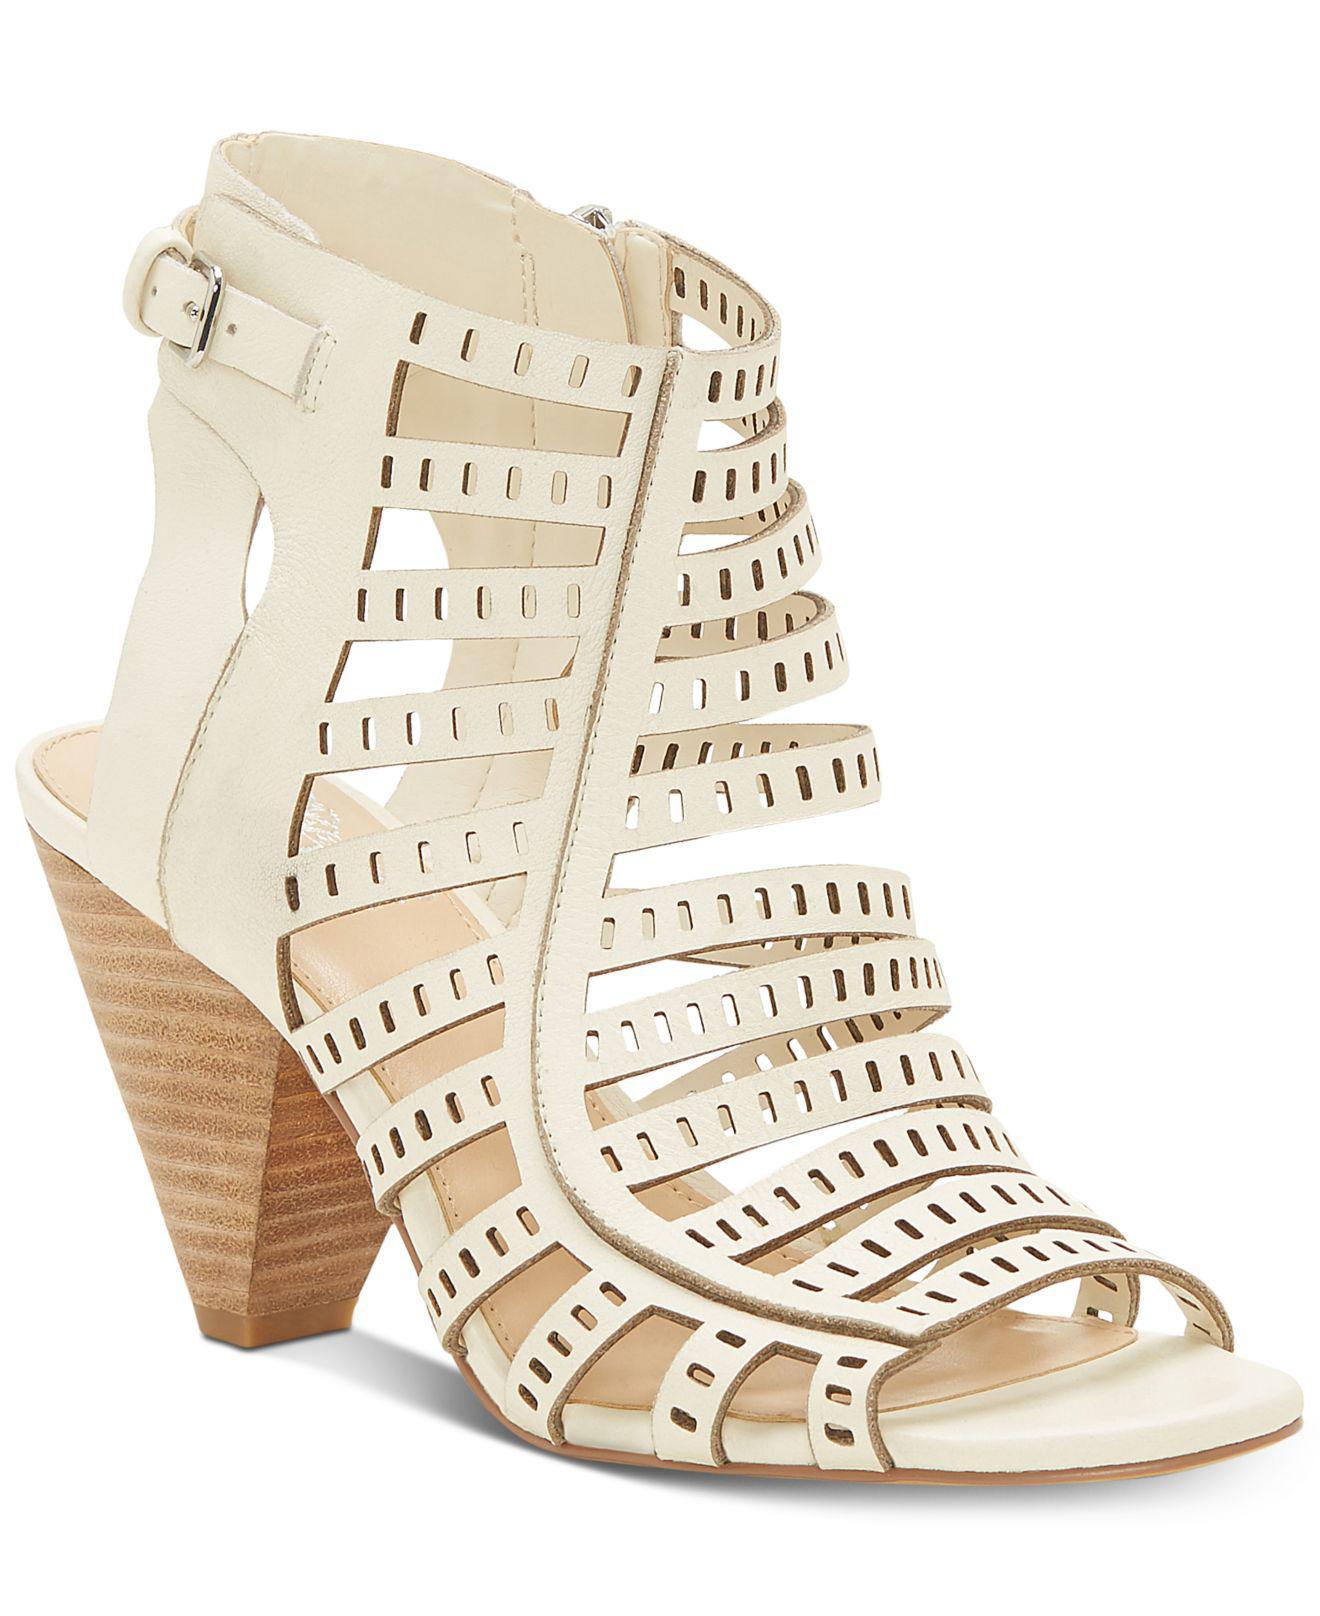 Vince Camuto Elison Cone-Heel Dress Sandals Women's Shoes ybV20C